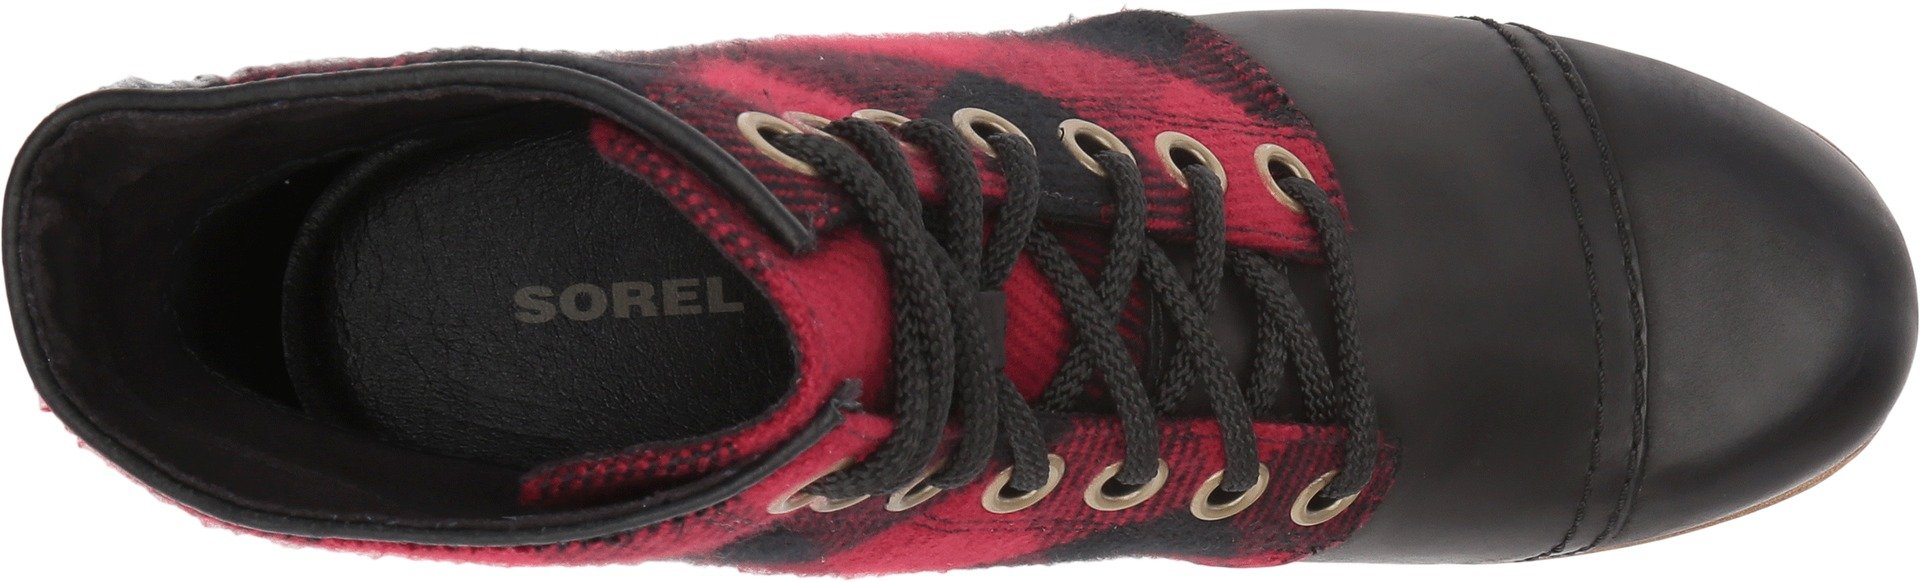 Sorel Women's PDX Wedge Booties, Black, 9.5 B(M) US by SOREL (Image #2)